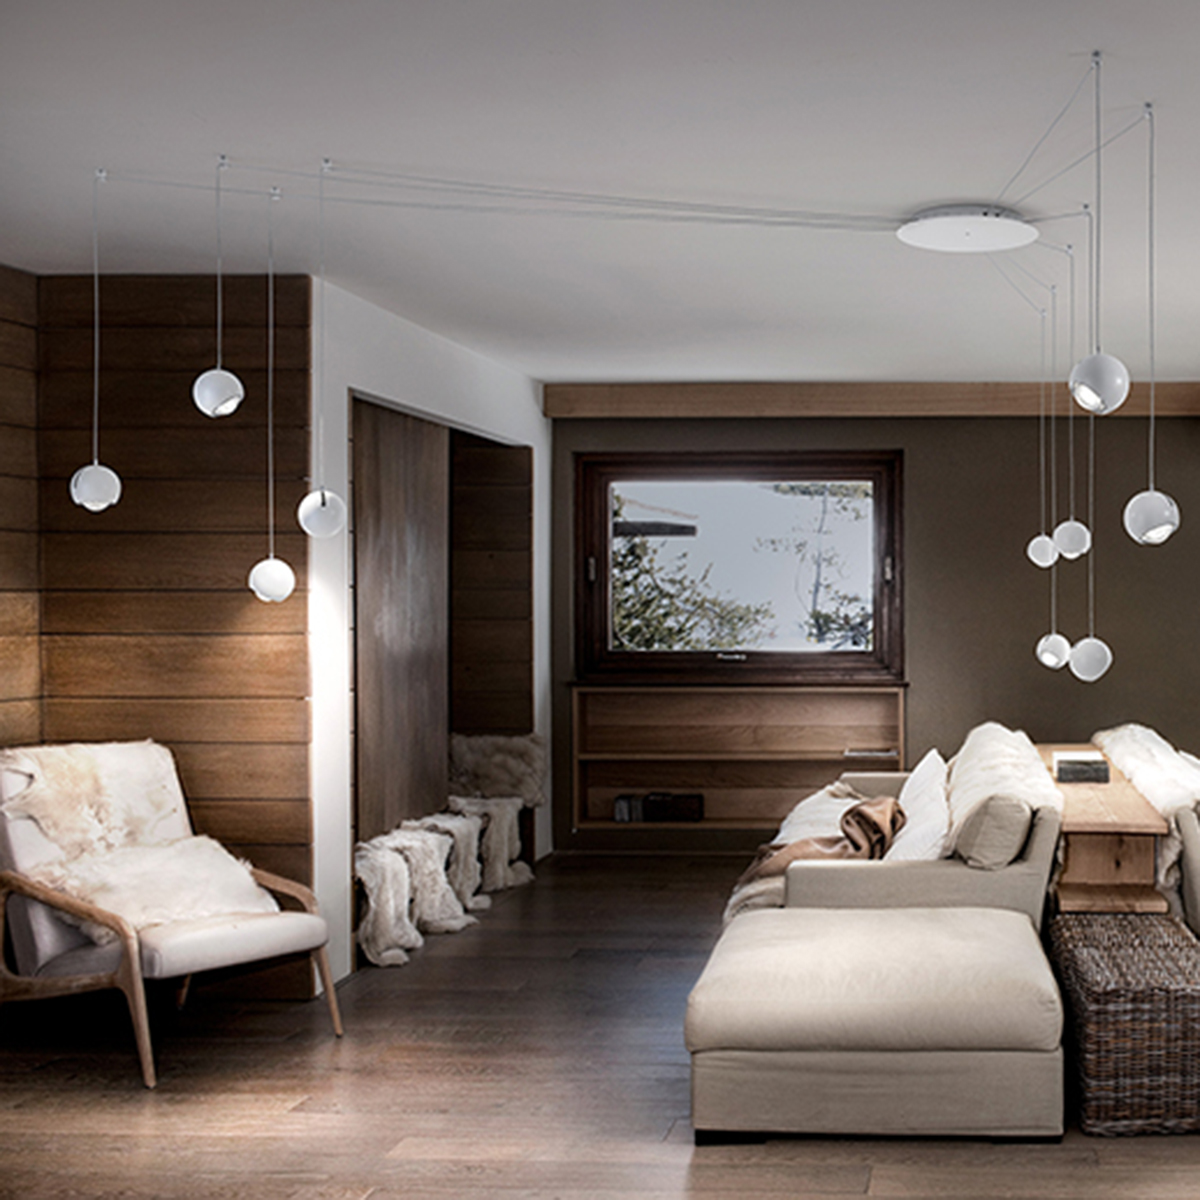 studio italia design spider pendelleuchte 10 flg. Black Bedroom Furniture Sets. Home Design Ideas